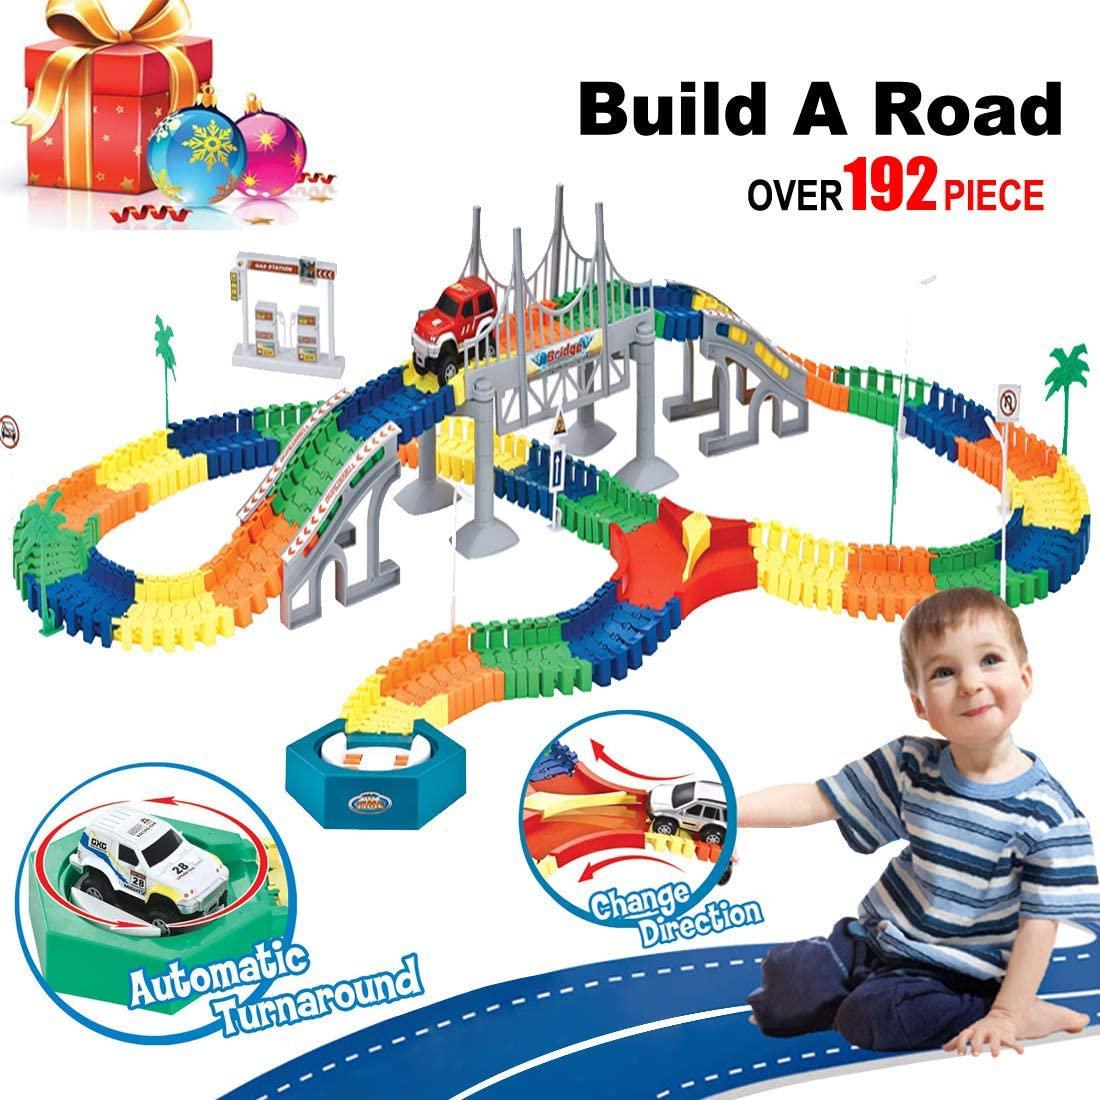 Build-A-Road Flexible Tracks Playset